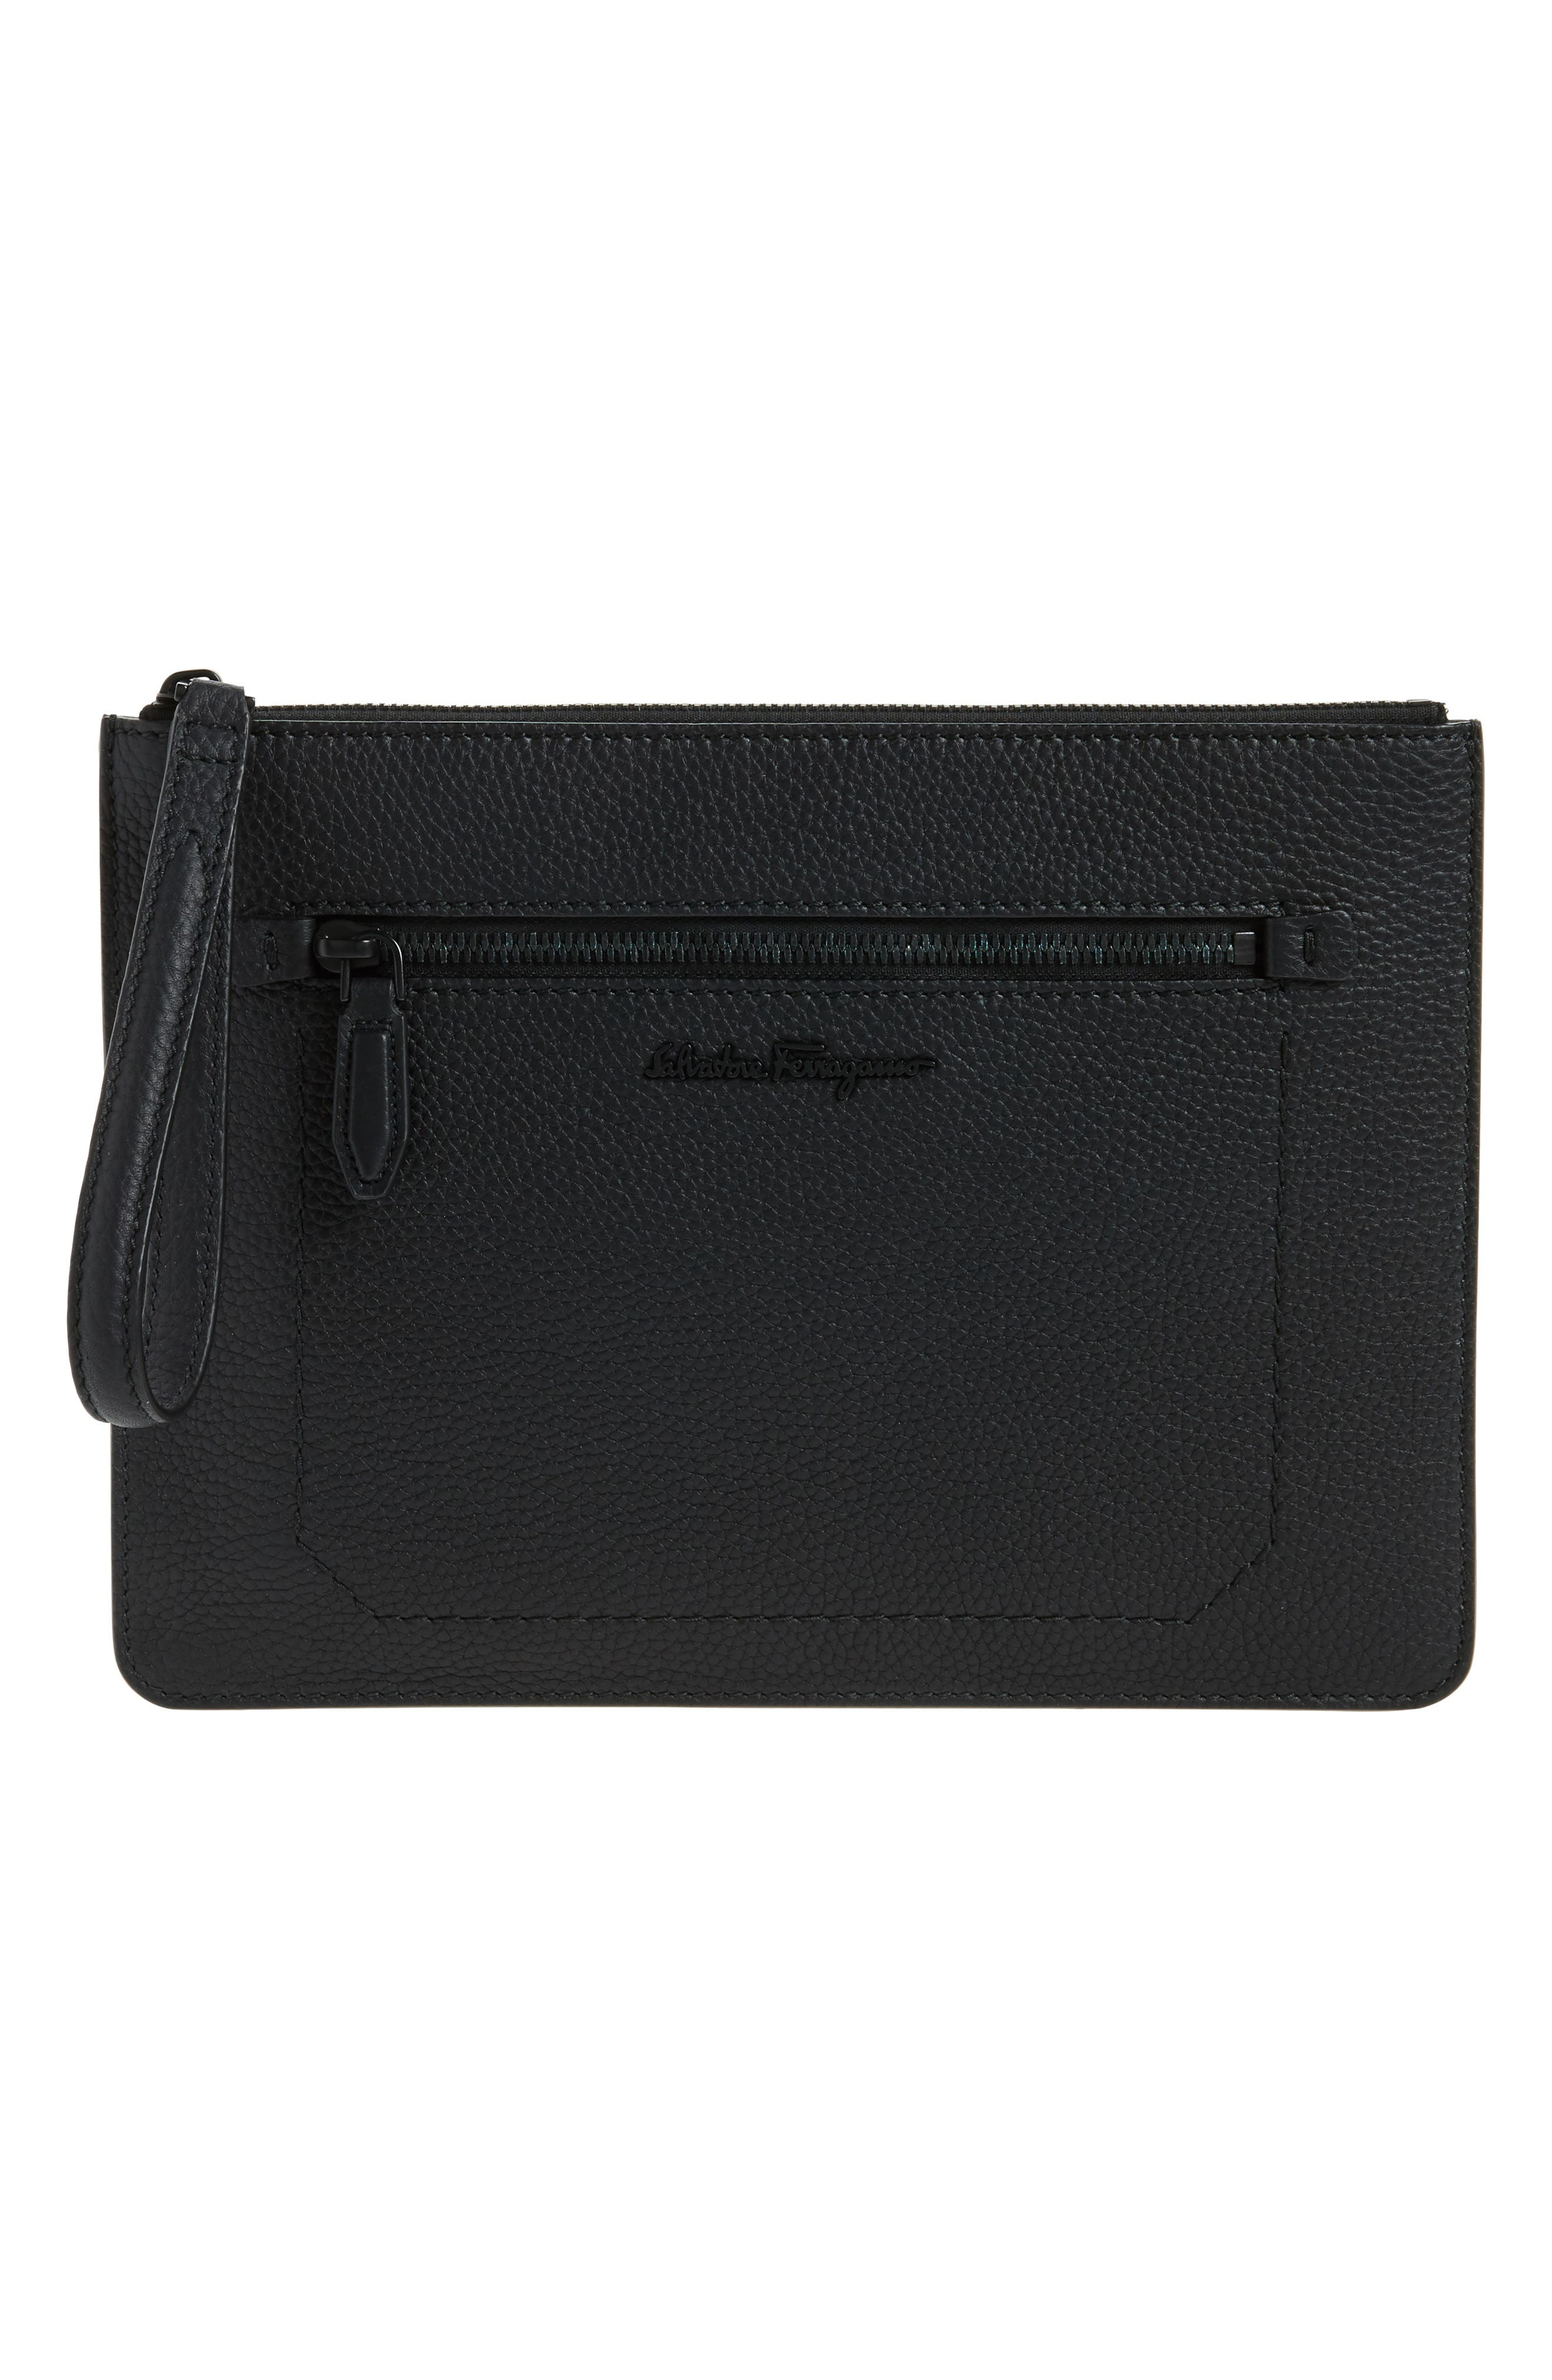 Calfskin Leather Portfolio,                             Main thumbnail 1, color,                             Black